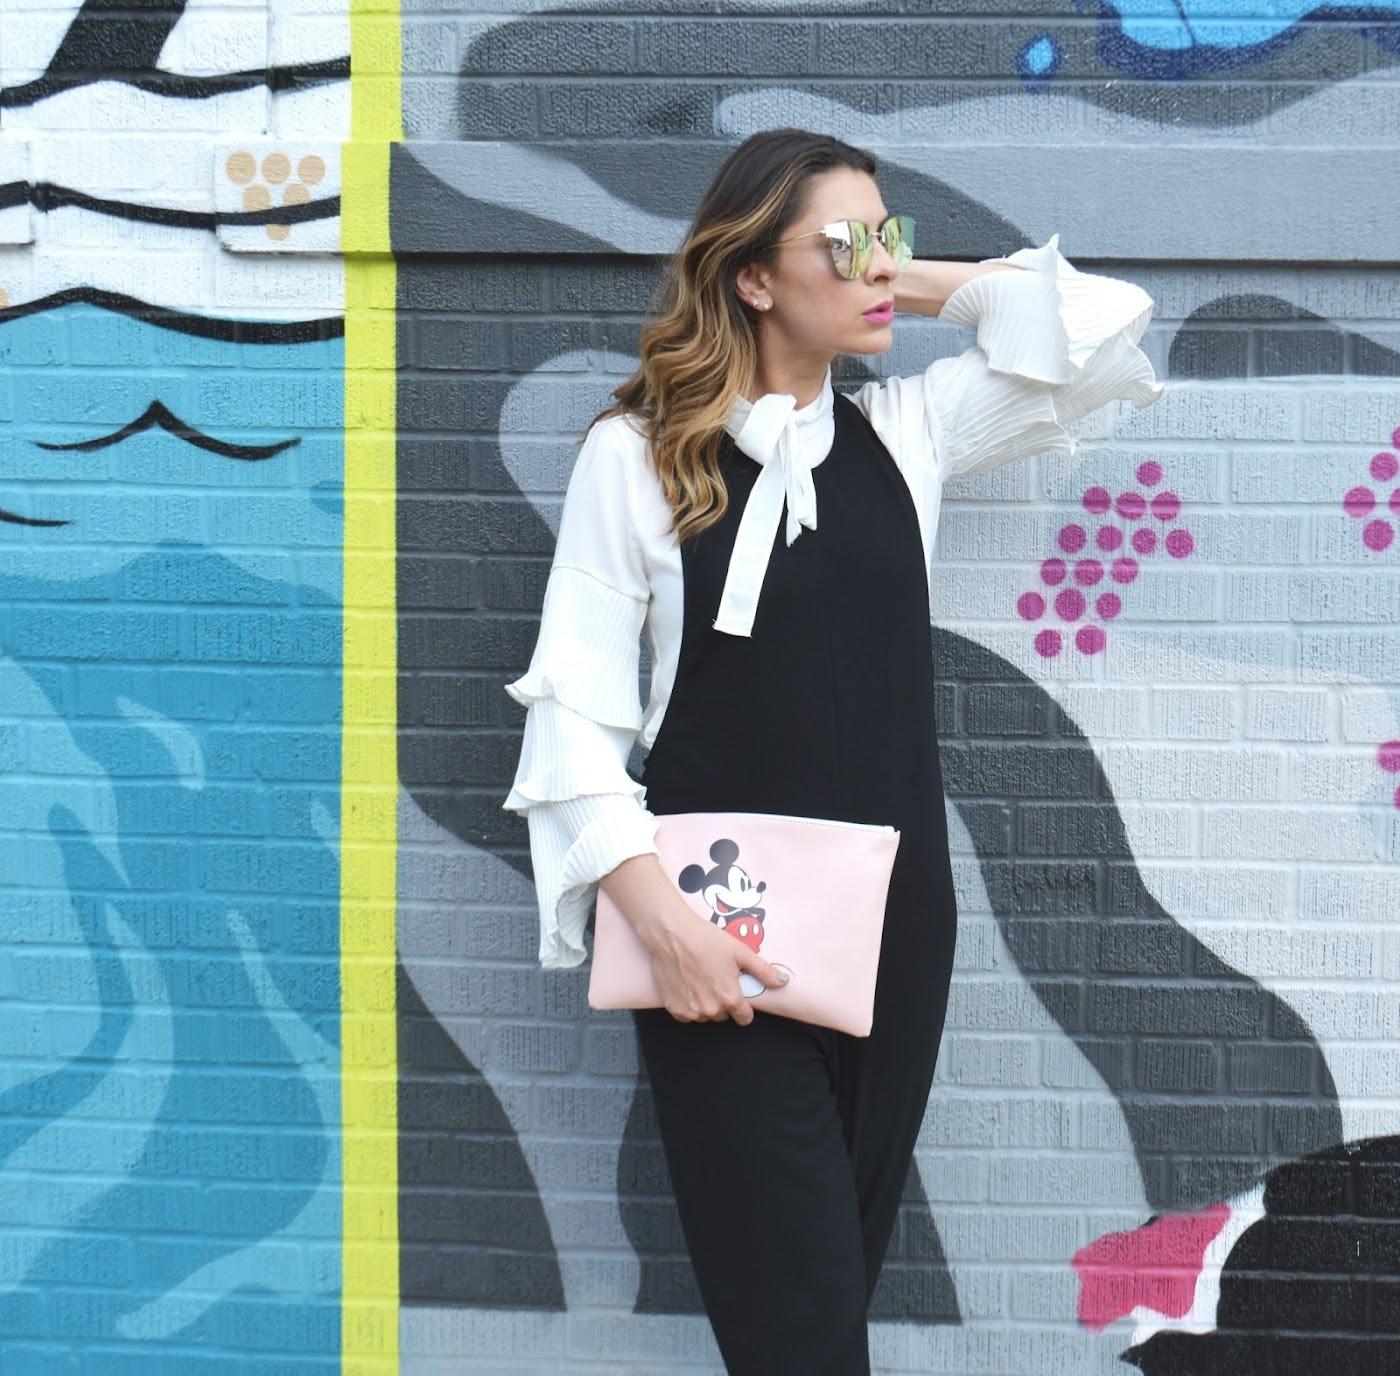 bloguera, bloguera de estilo, bloguera de moda, Chicago blogger, Chicago murals, Desiree Velasquez, Disney style, estilo verano, Fashionlingual, frameless sunglasses, Latina blogger, Mickey Mouse clutch, pleated sleeves, street-style, studded sandals, style blogger, summer style, Zaful, Zaful pleated sleeve top, Zaful style, pleated ruffle sleeves, mangas plisadas con volantes, Pleated Sleeves by Zaful, Fulton Market Murals, Chicago murals